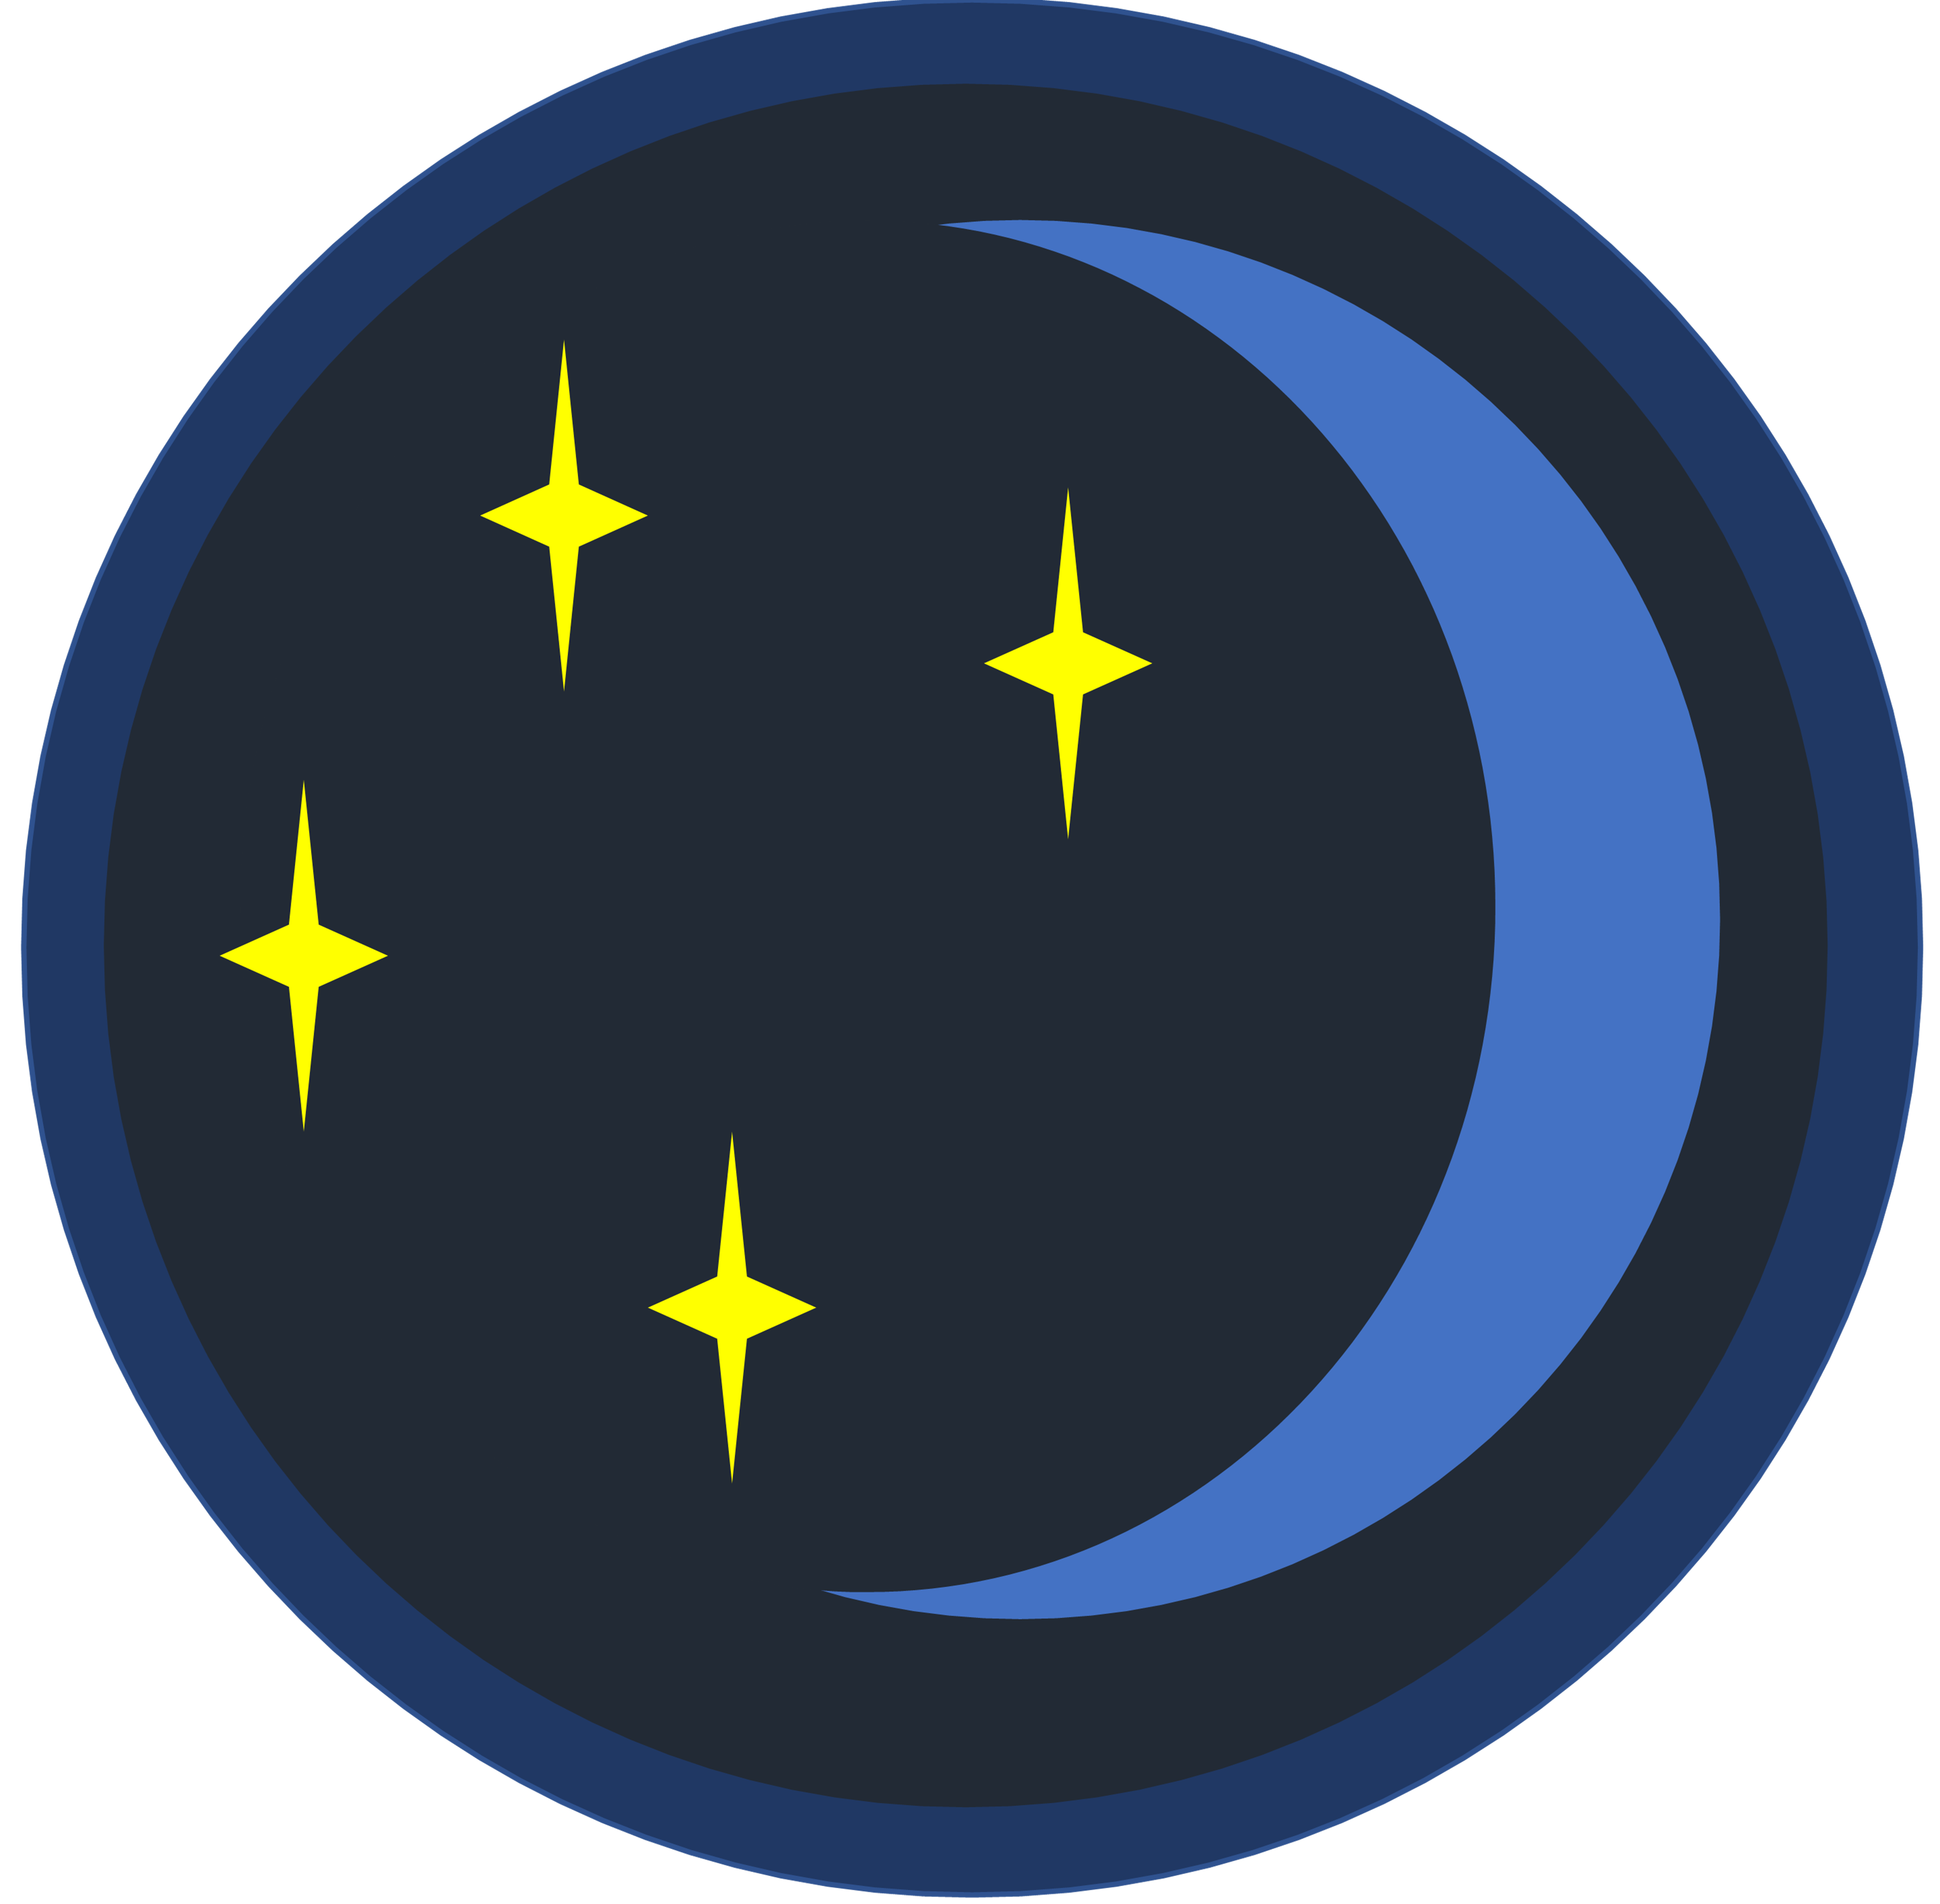 NightBlue